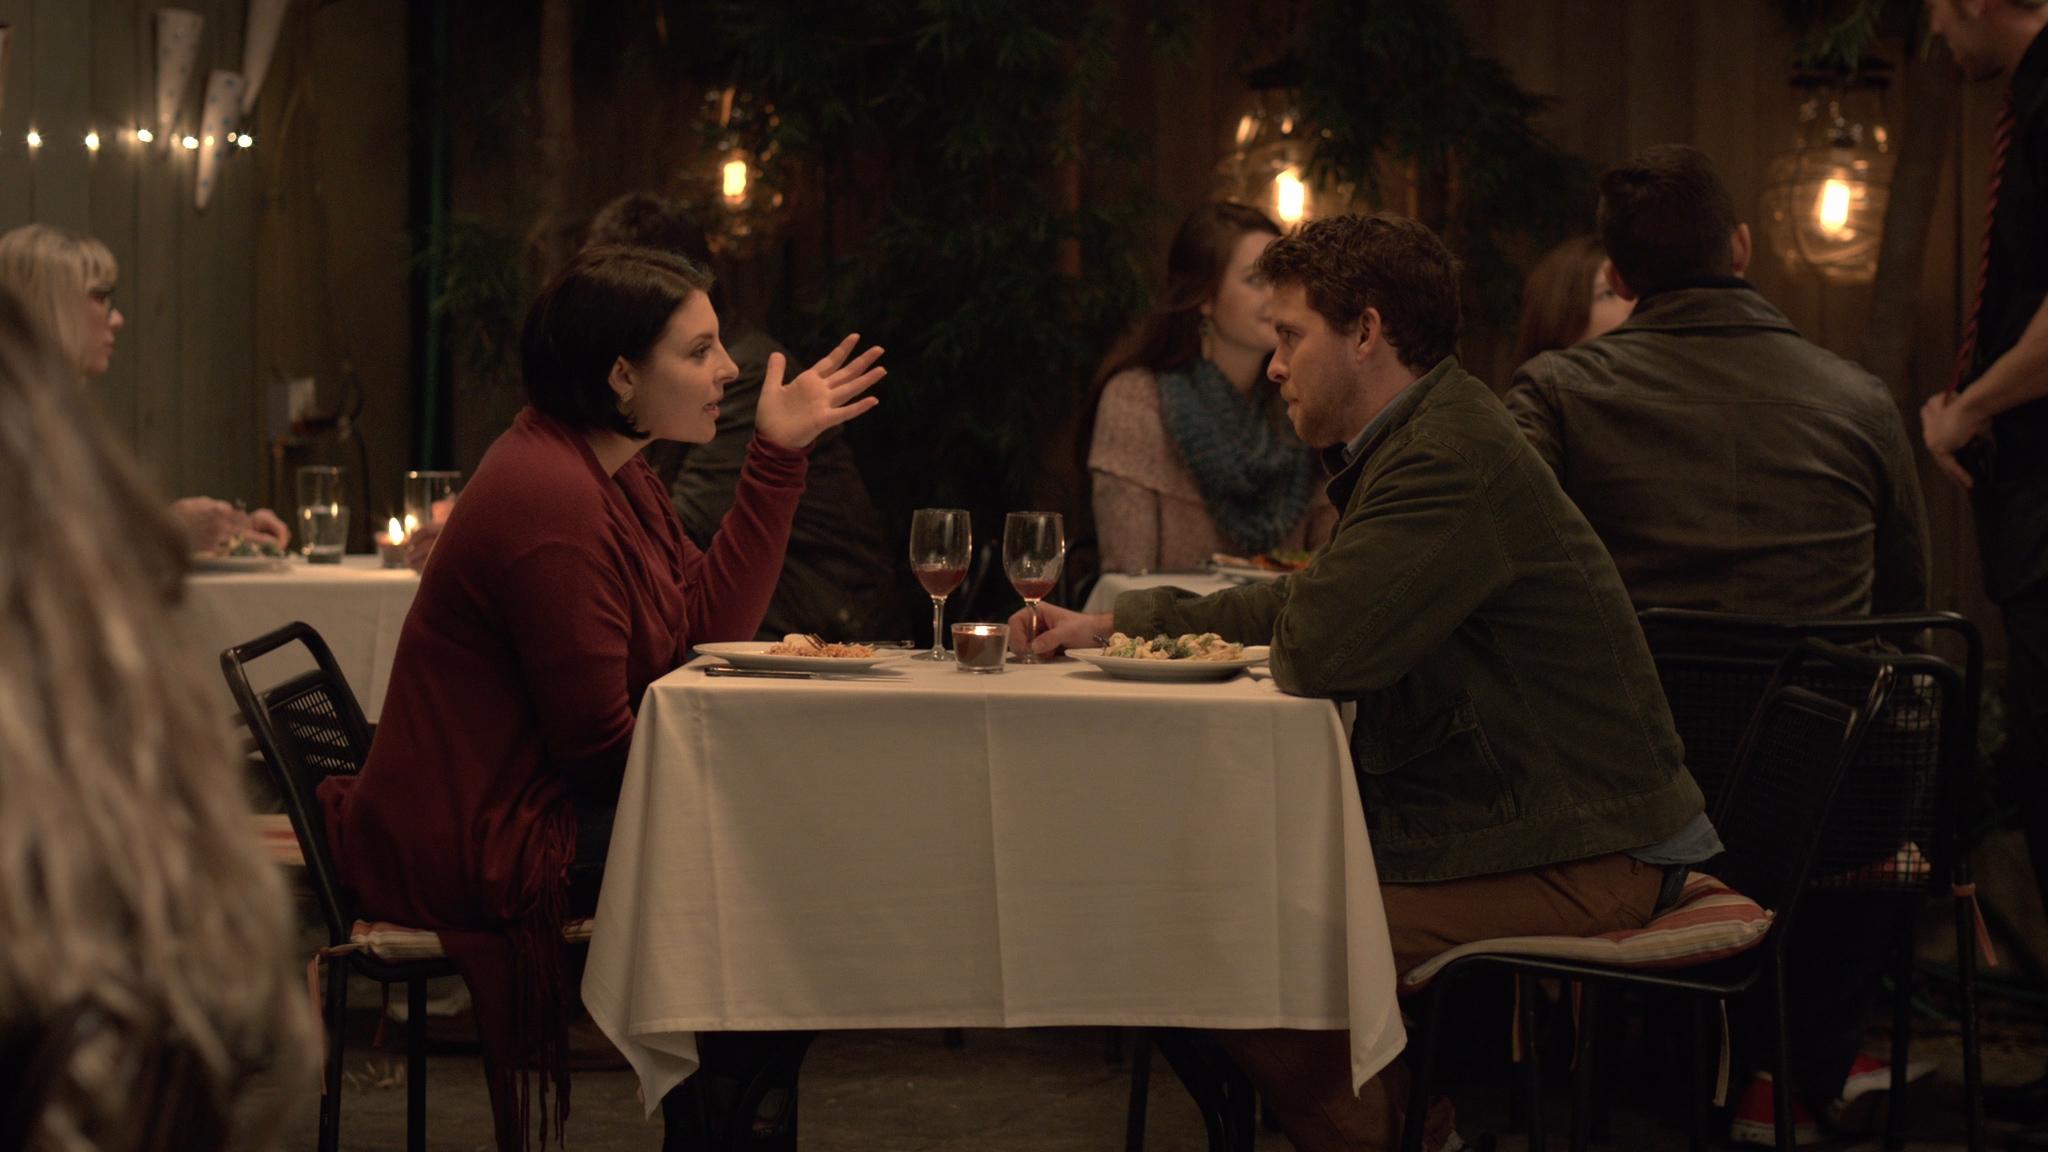 Restaurant scene of Sam and Ben's date